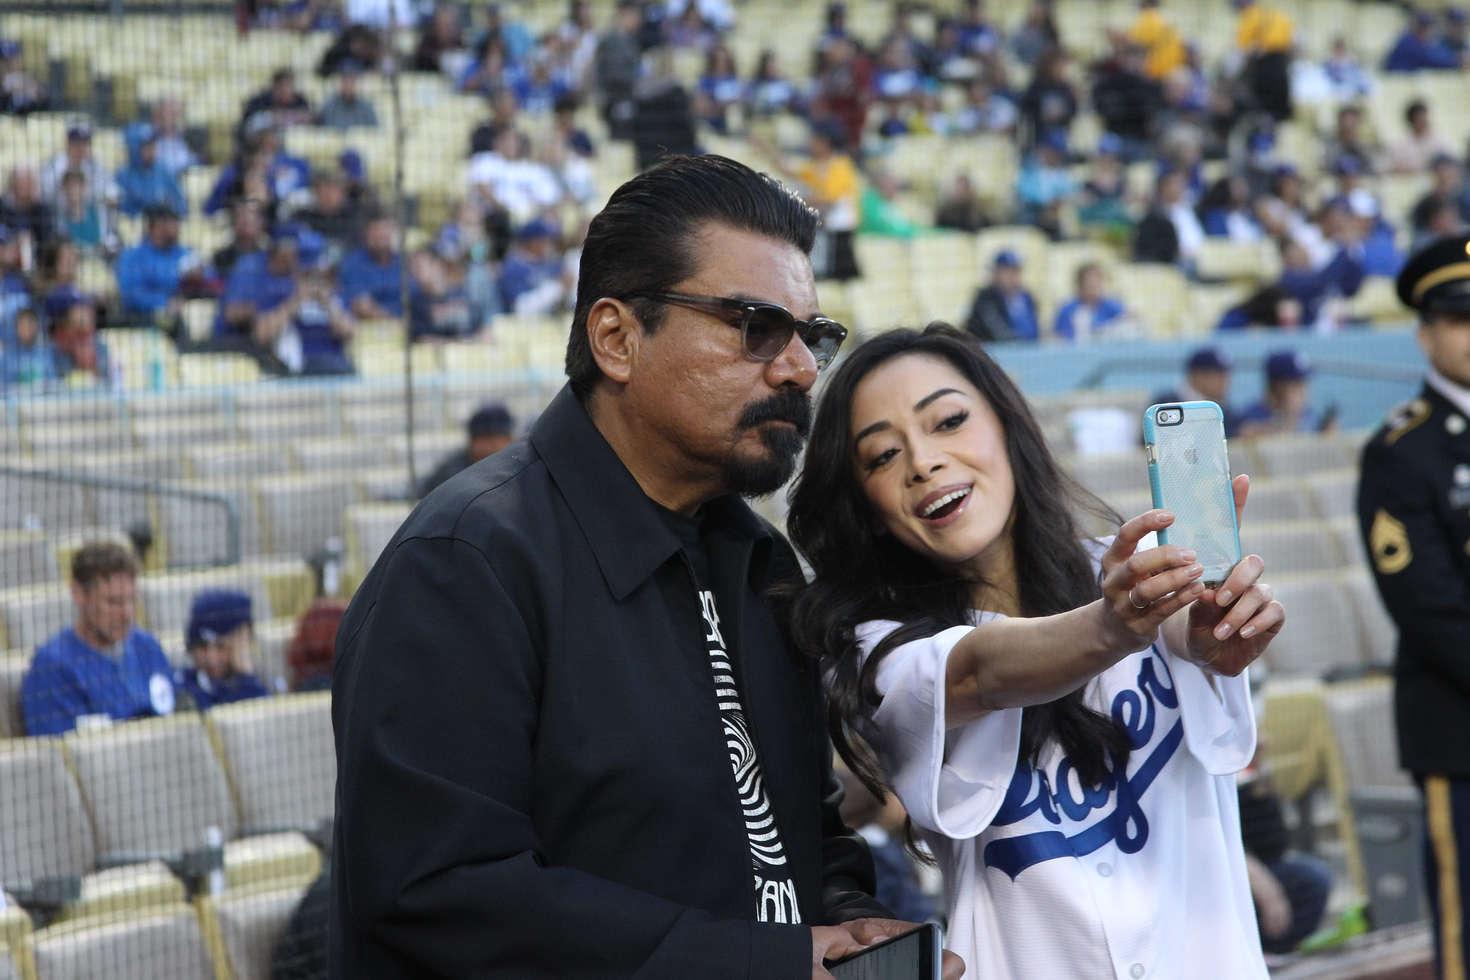 Aimee Garcia at Dodger Stadium in Los Angeles